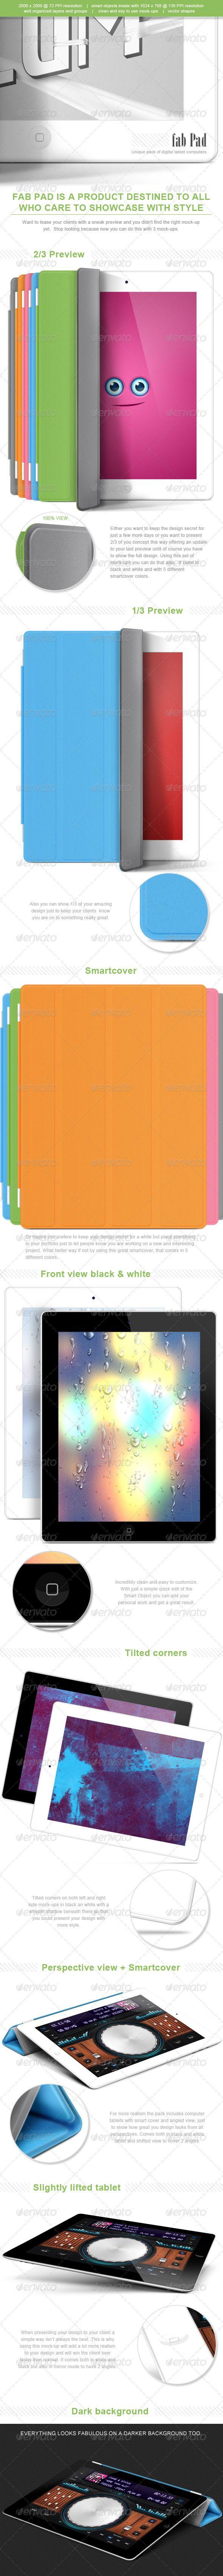 Fab Pad - 19 Digital Tablet Computers Mock-Ups - Mobile Displays